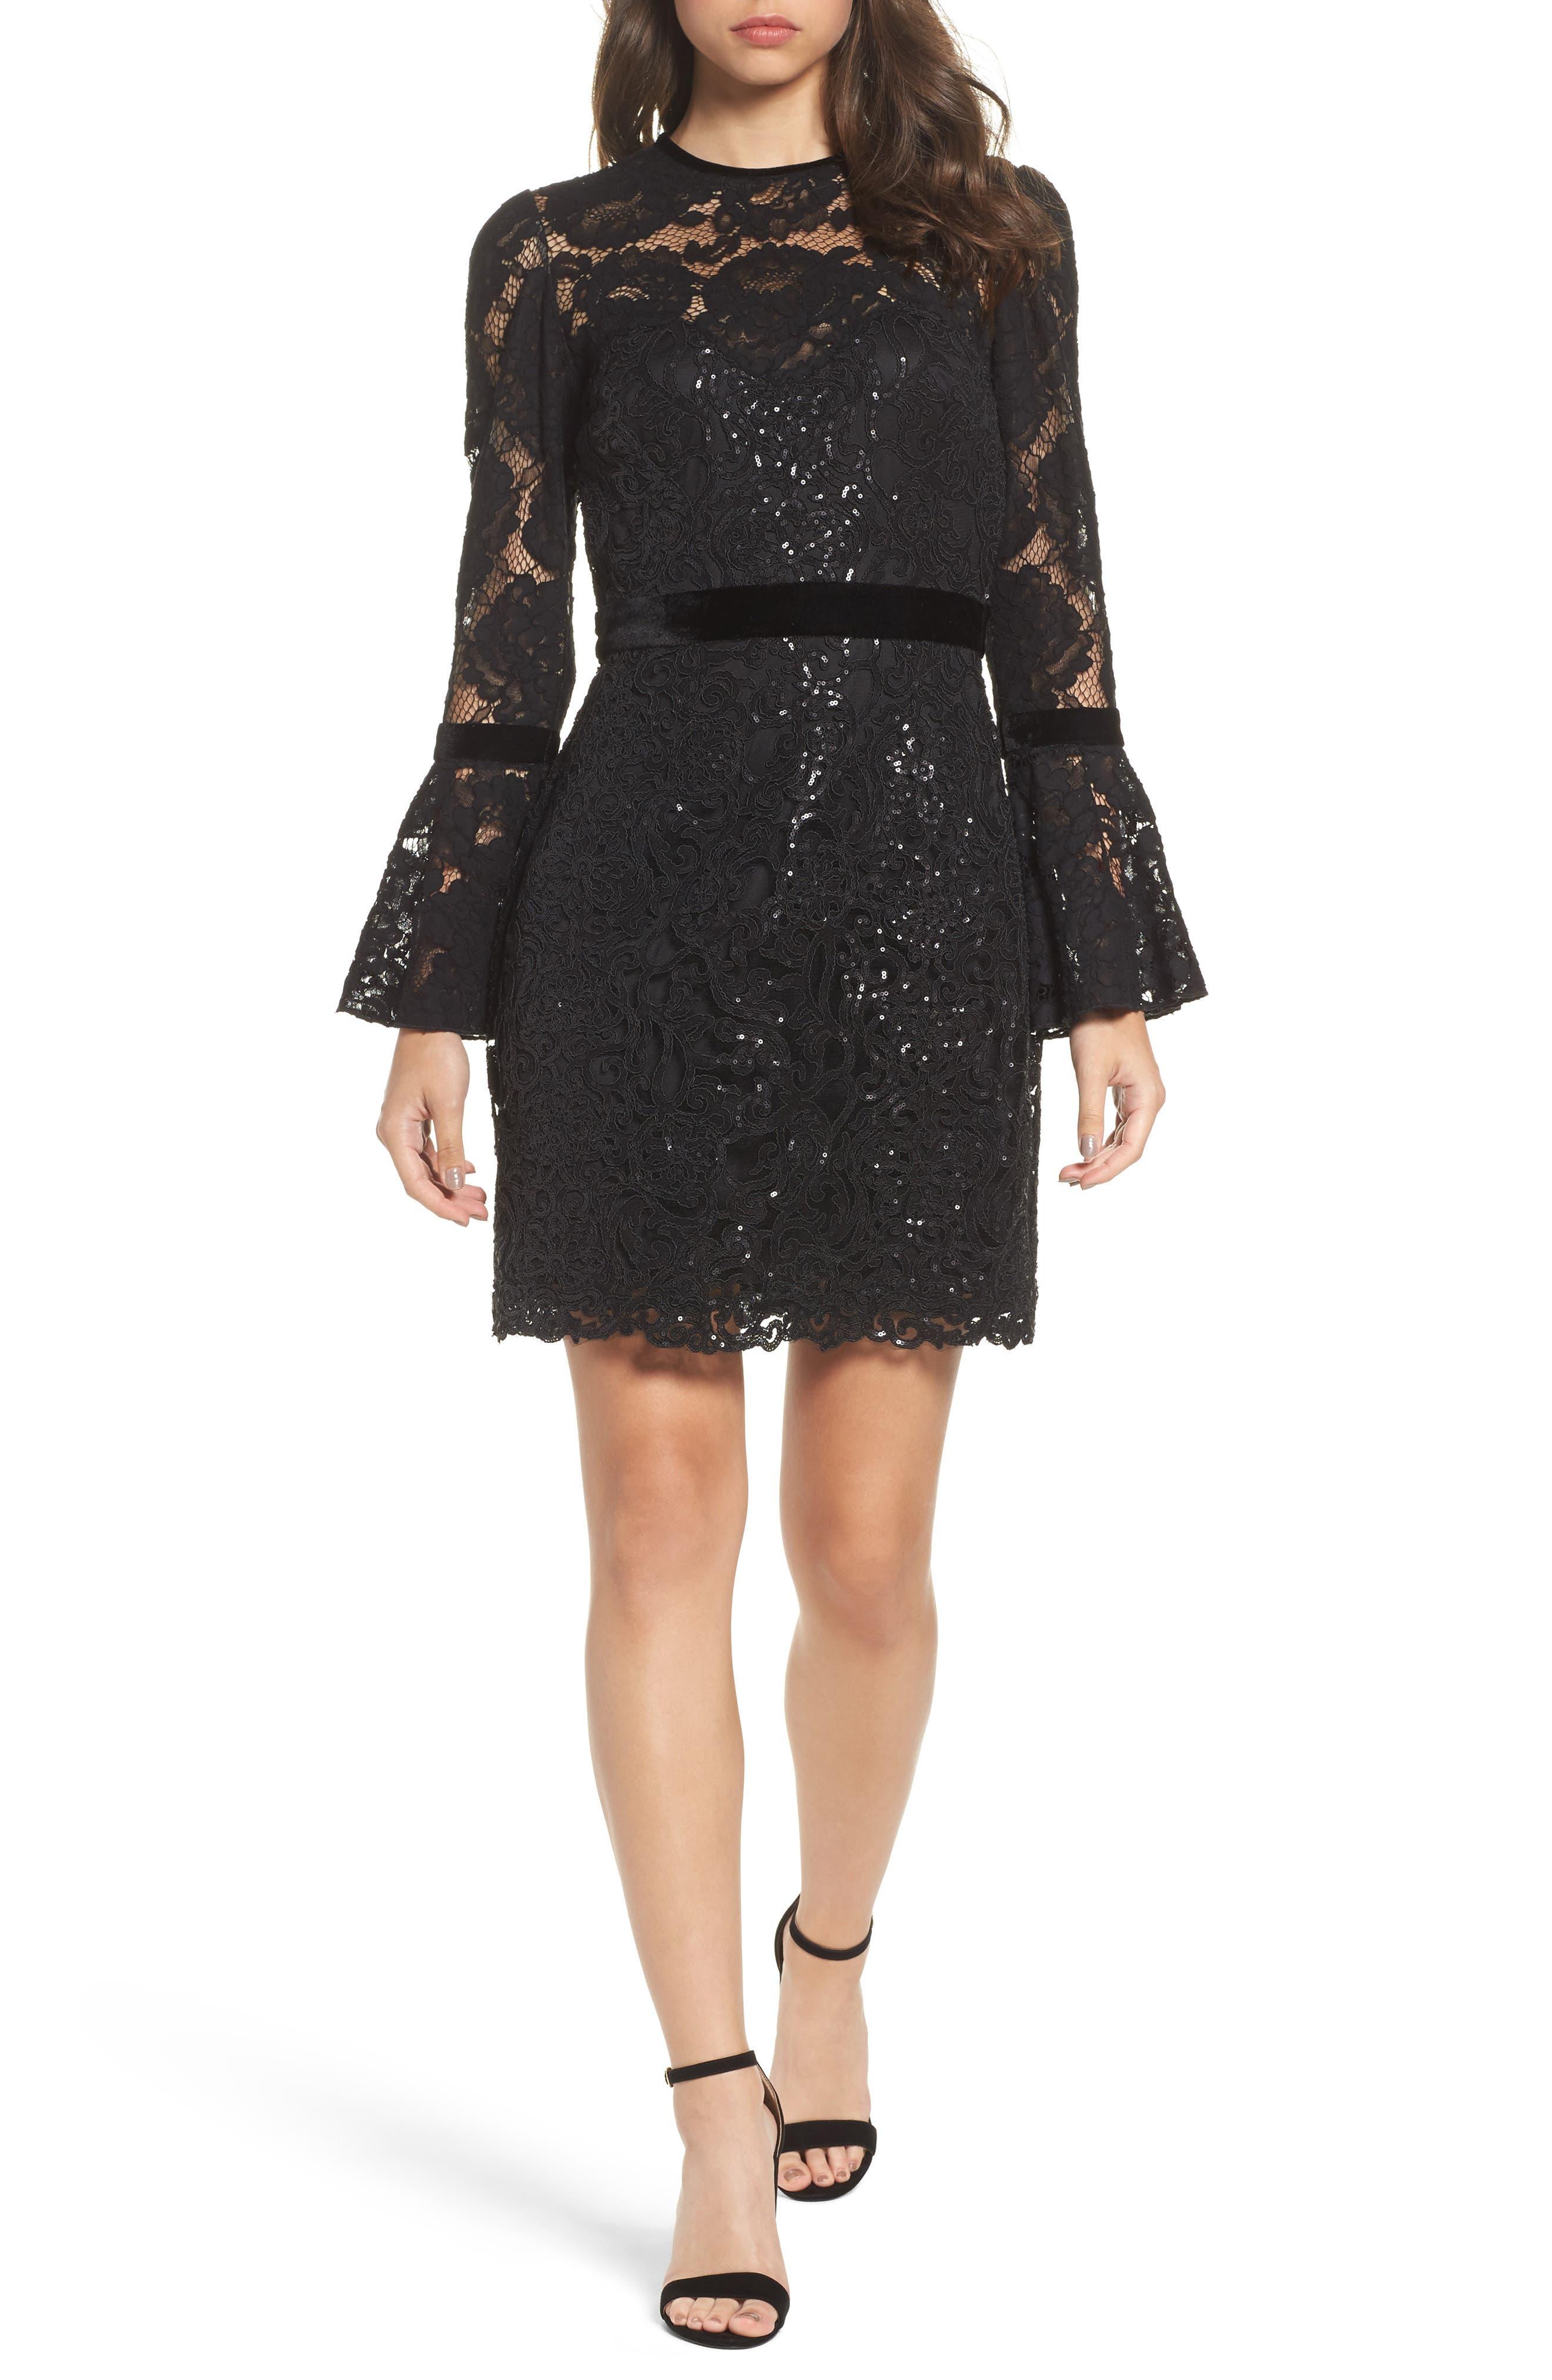 Main Image - Tadashi Shoji Bell Sleeve Rose & Sequin Lace Dress